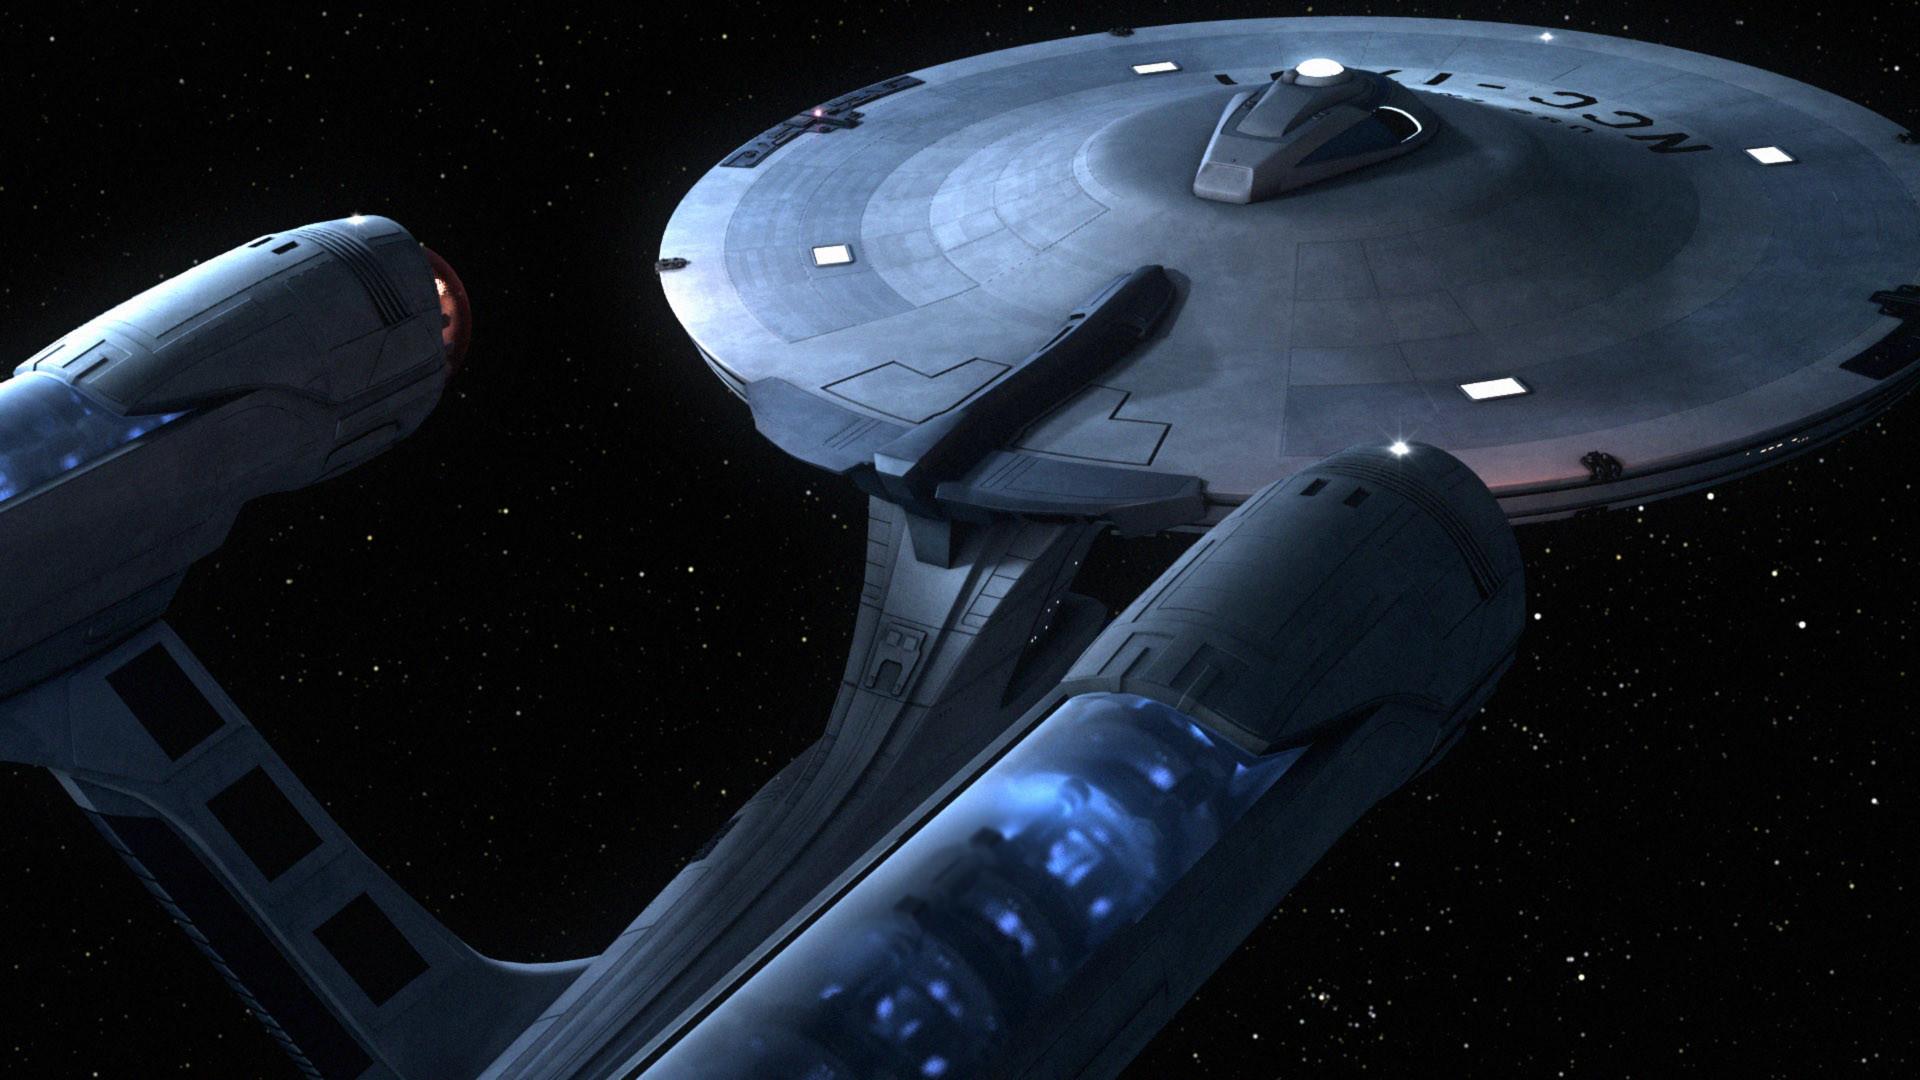 Star trek uss enterprise spaceships wallpaper – (#185004) – High .